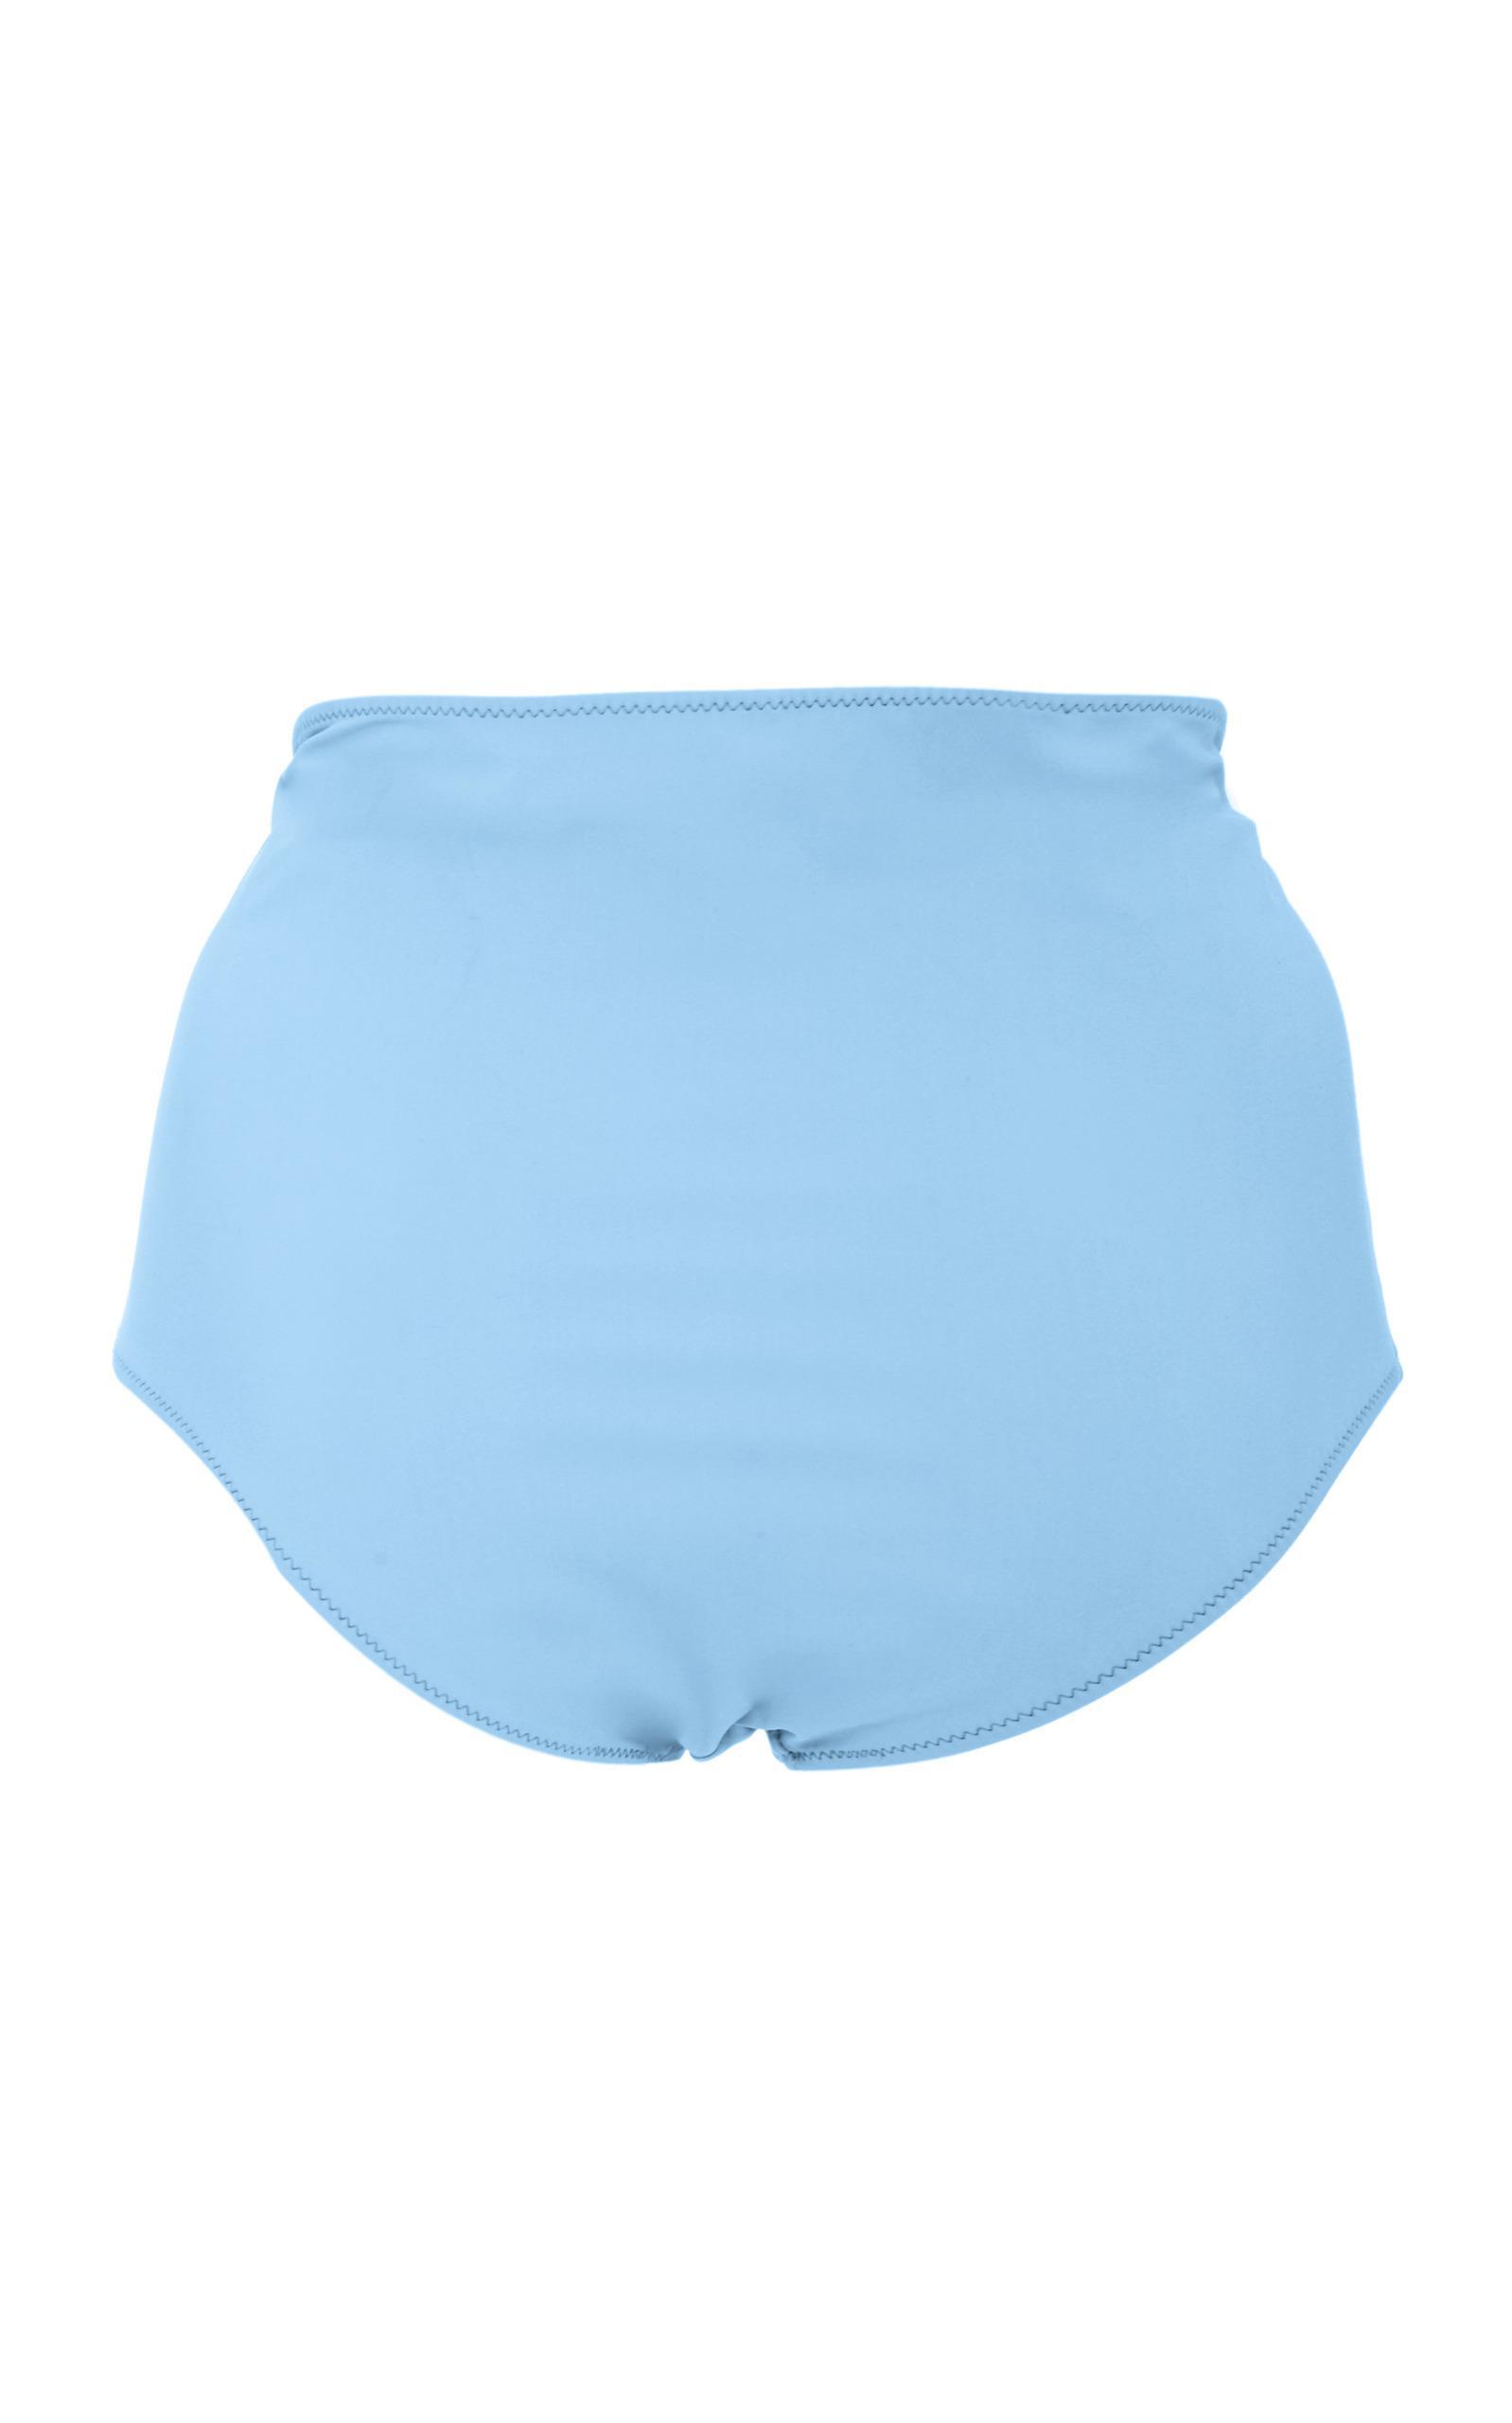 044e213847 Lyst - Araks Mallory High Rise Hipster Bikini Bottoms in Blue